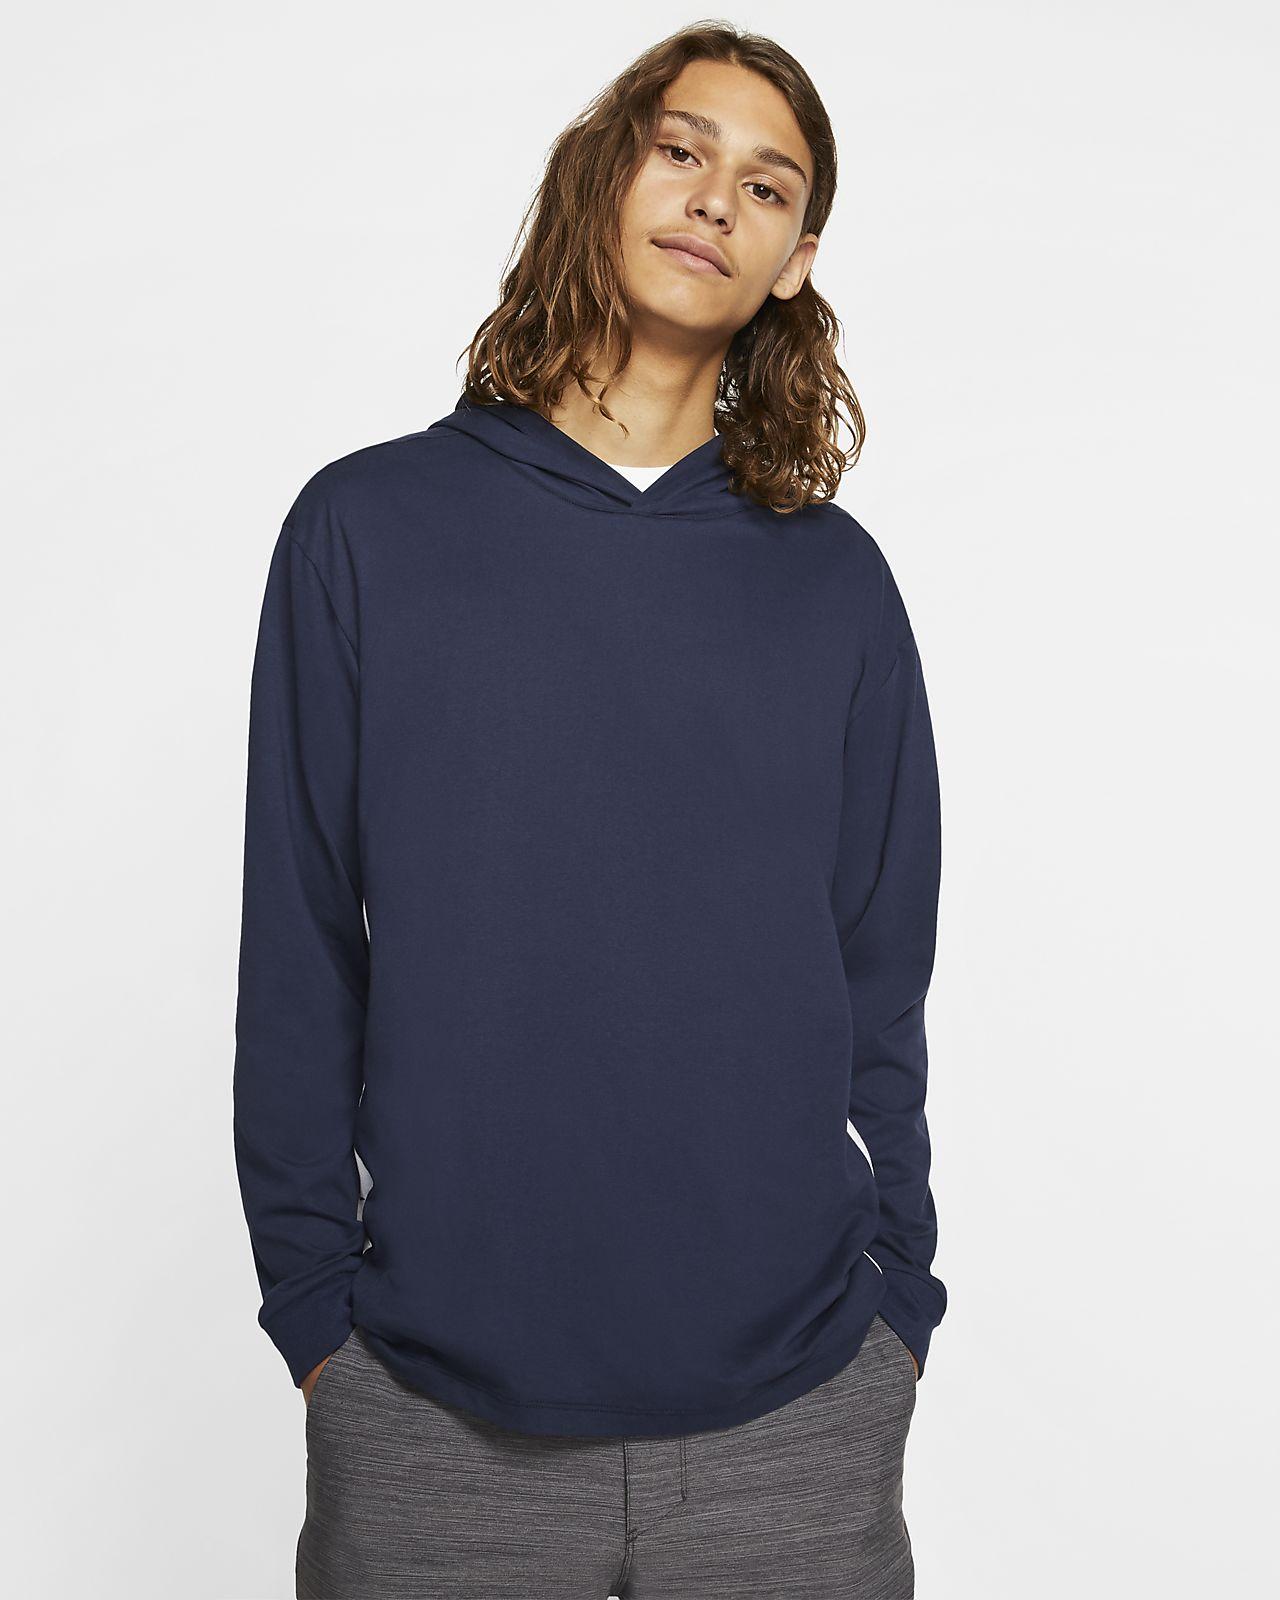 Męska bluza z kapturem i długim rękawem Hurley Dri-FIT Harvey